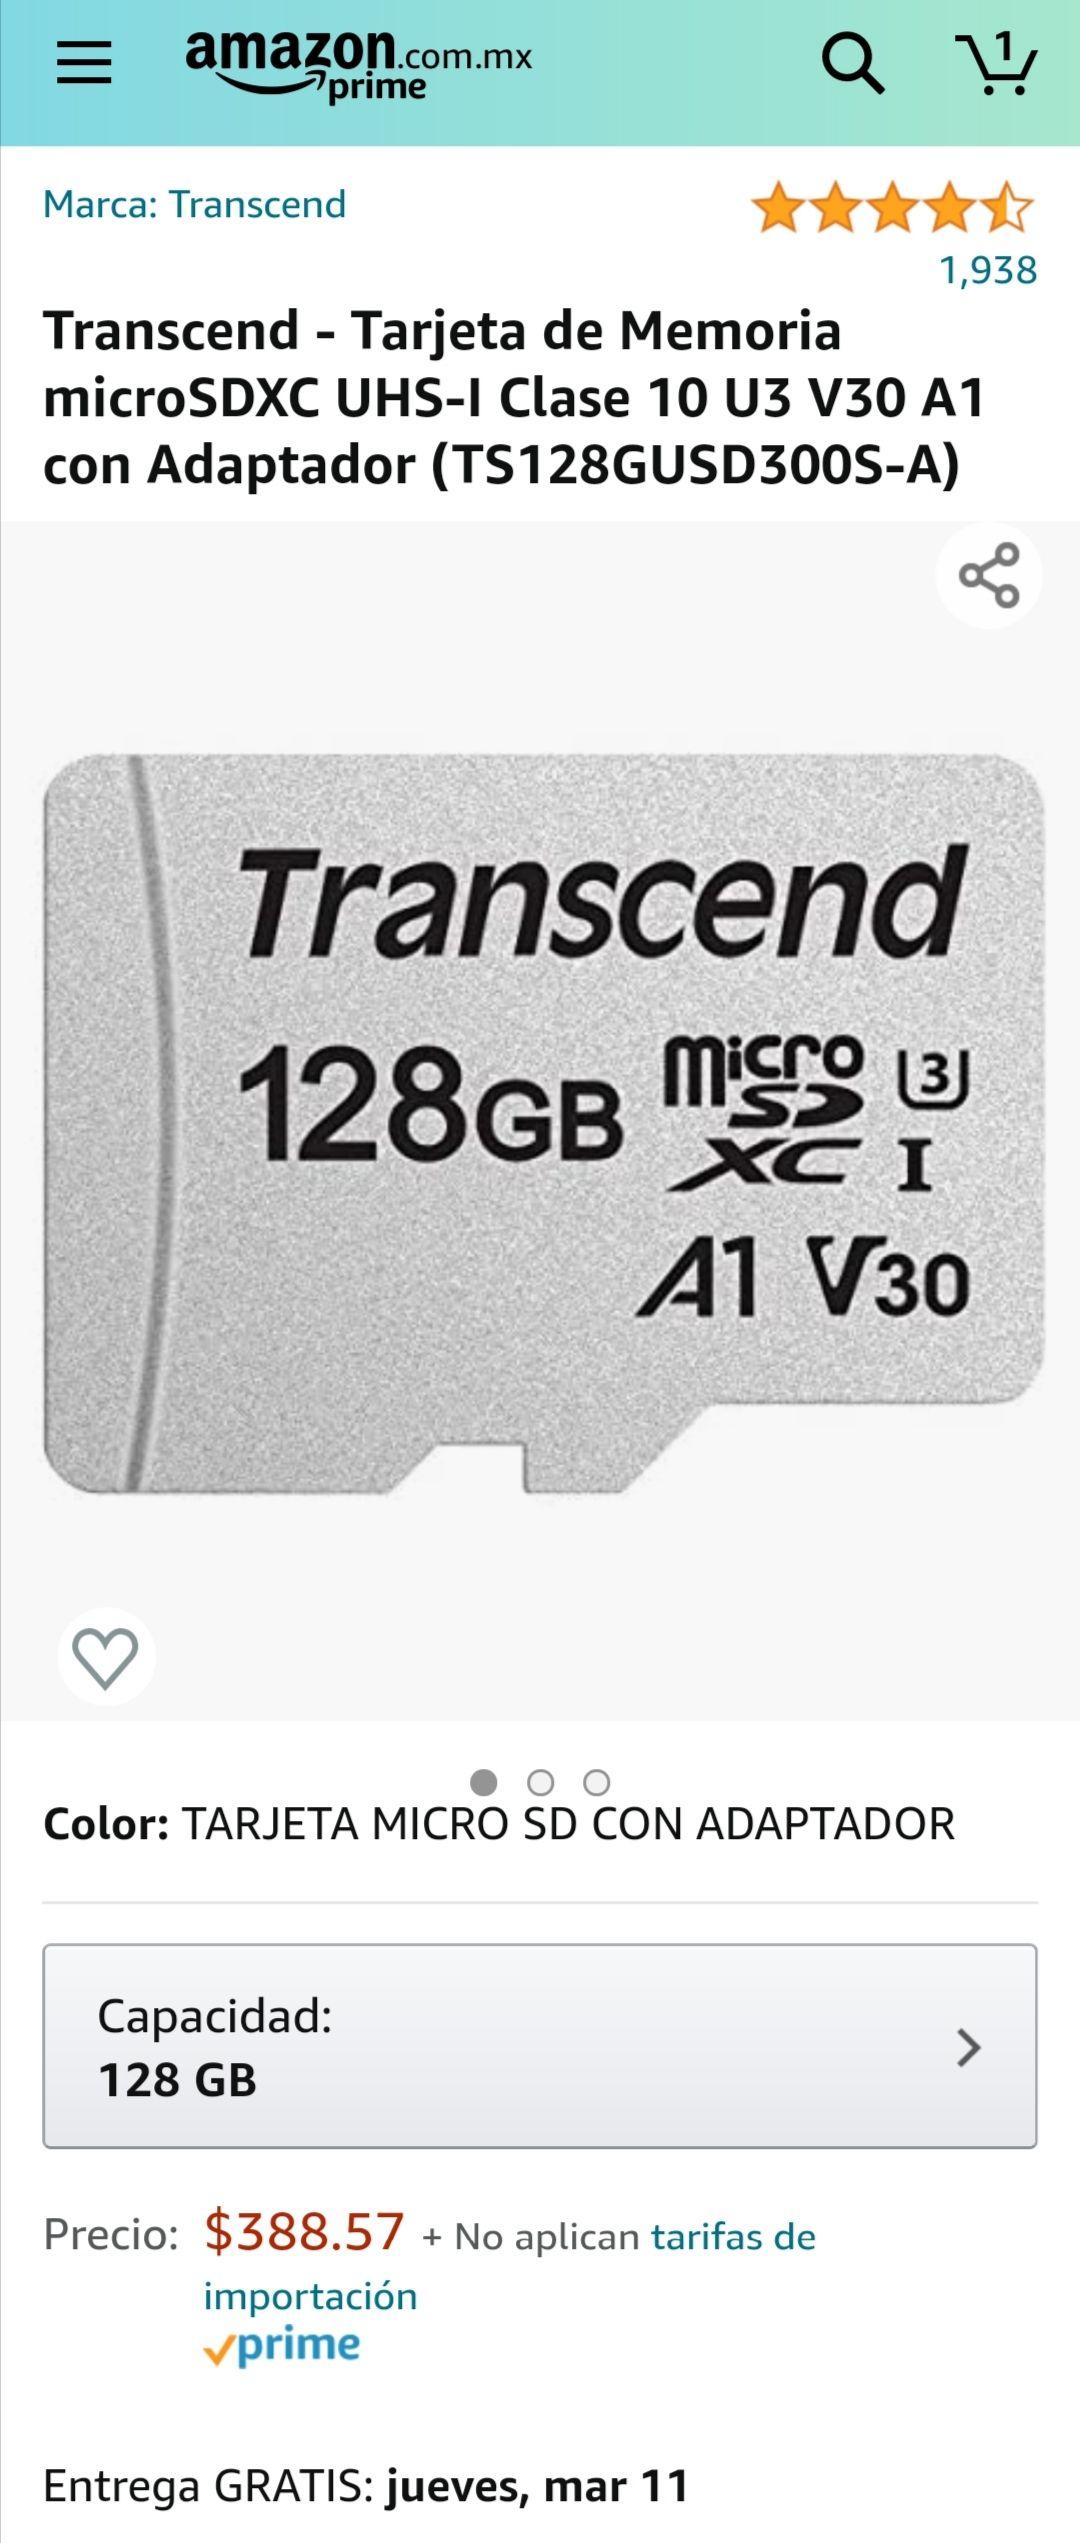 Amazon: Transcend Memoria Micro SDXC UHS-1 Clase 10 U3 V30 A1 100MB/s 4K